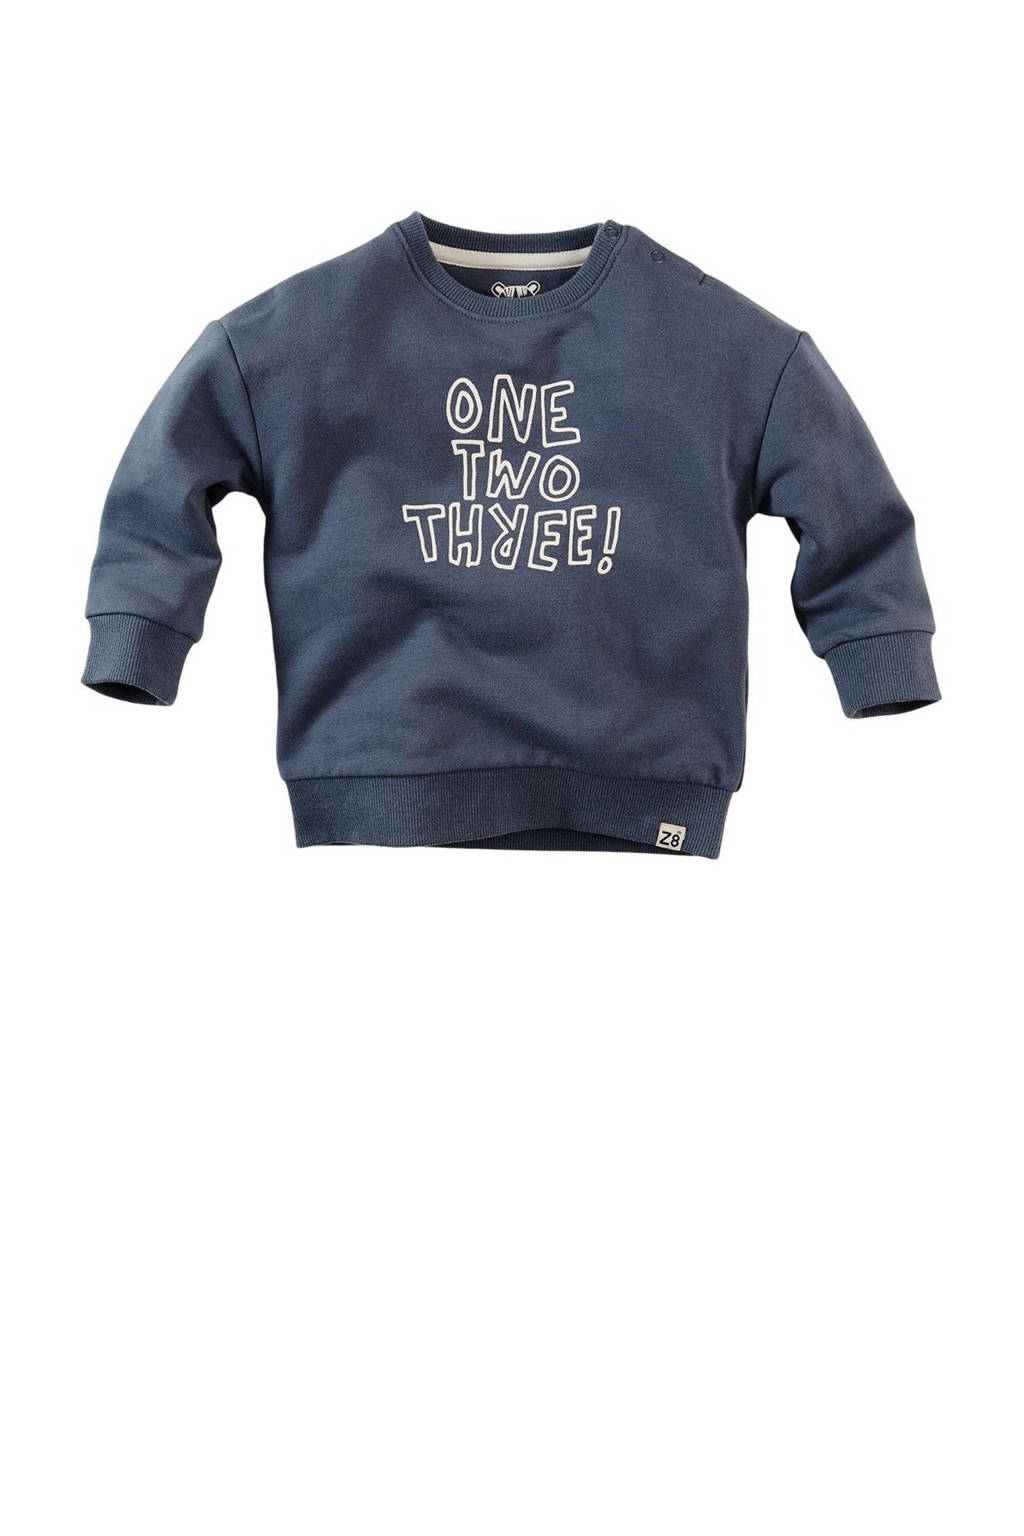 Z8 sweater Tito met tekst donkerblauw, Donkerblauw